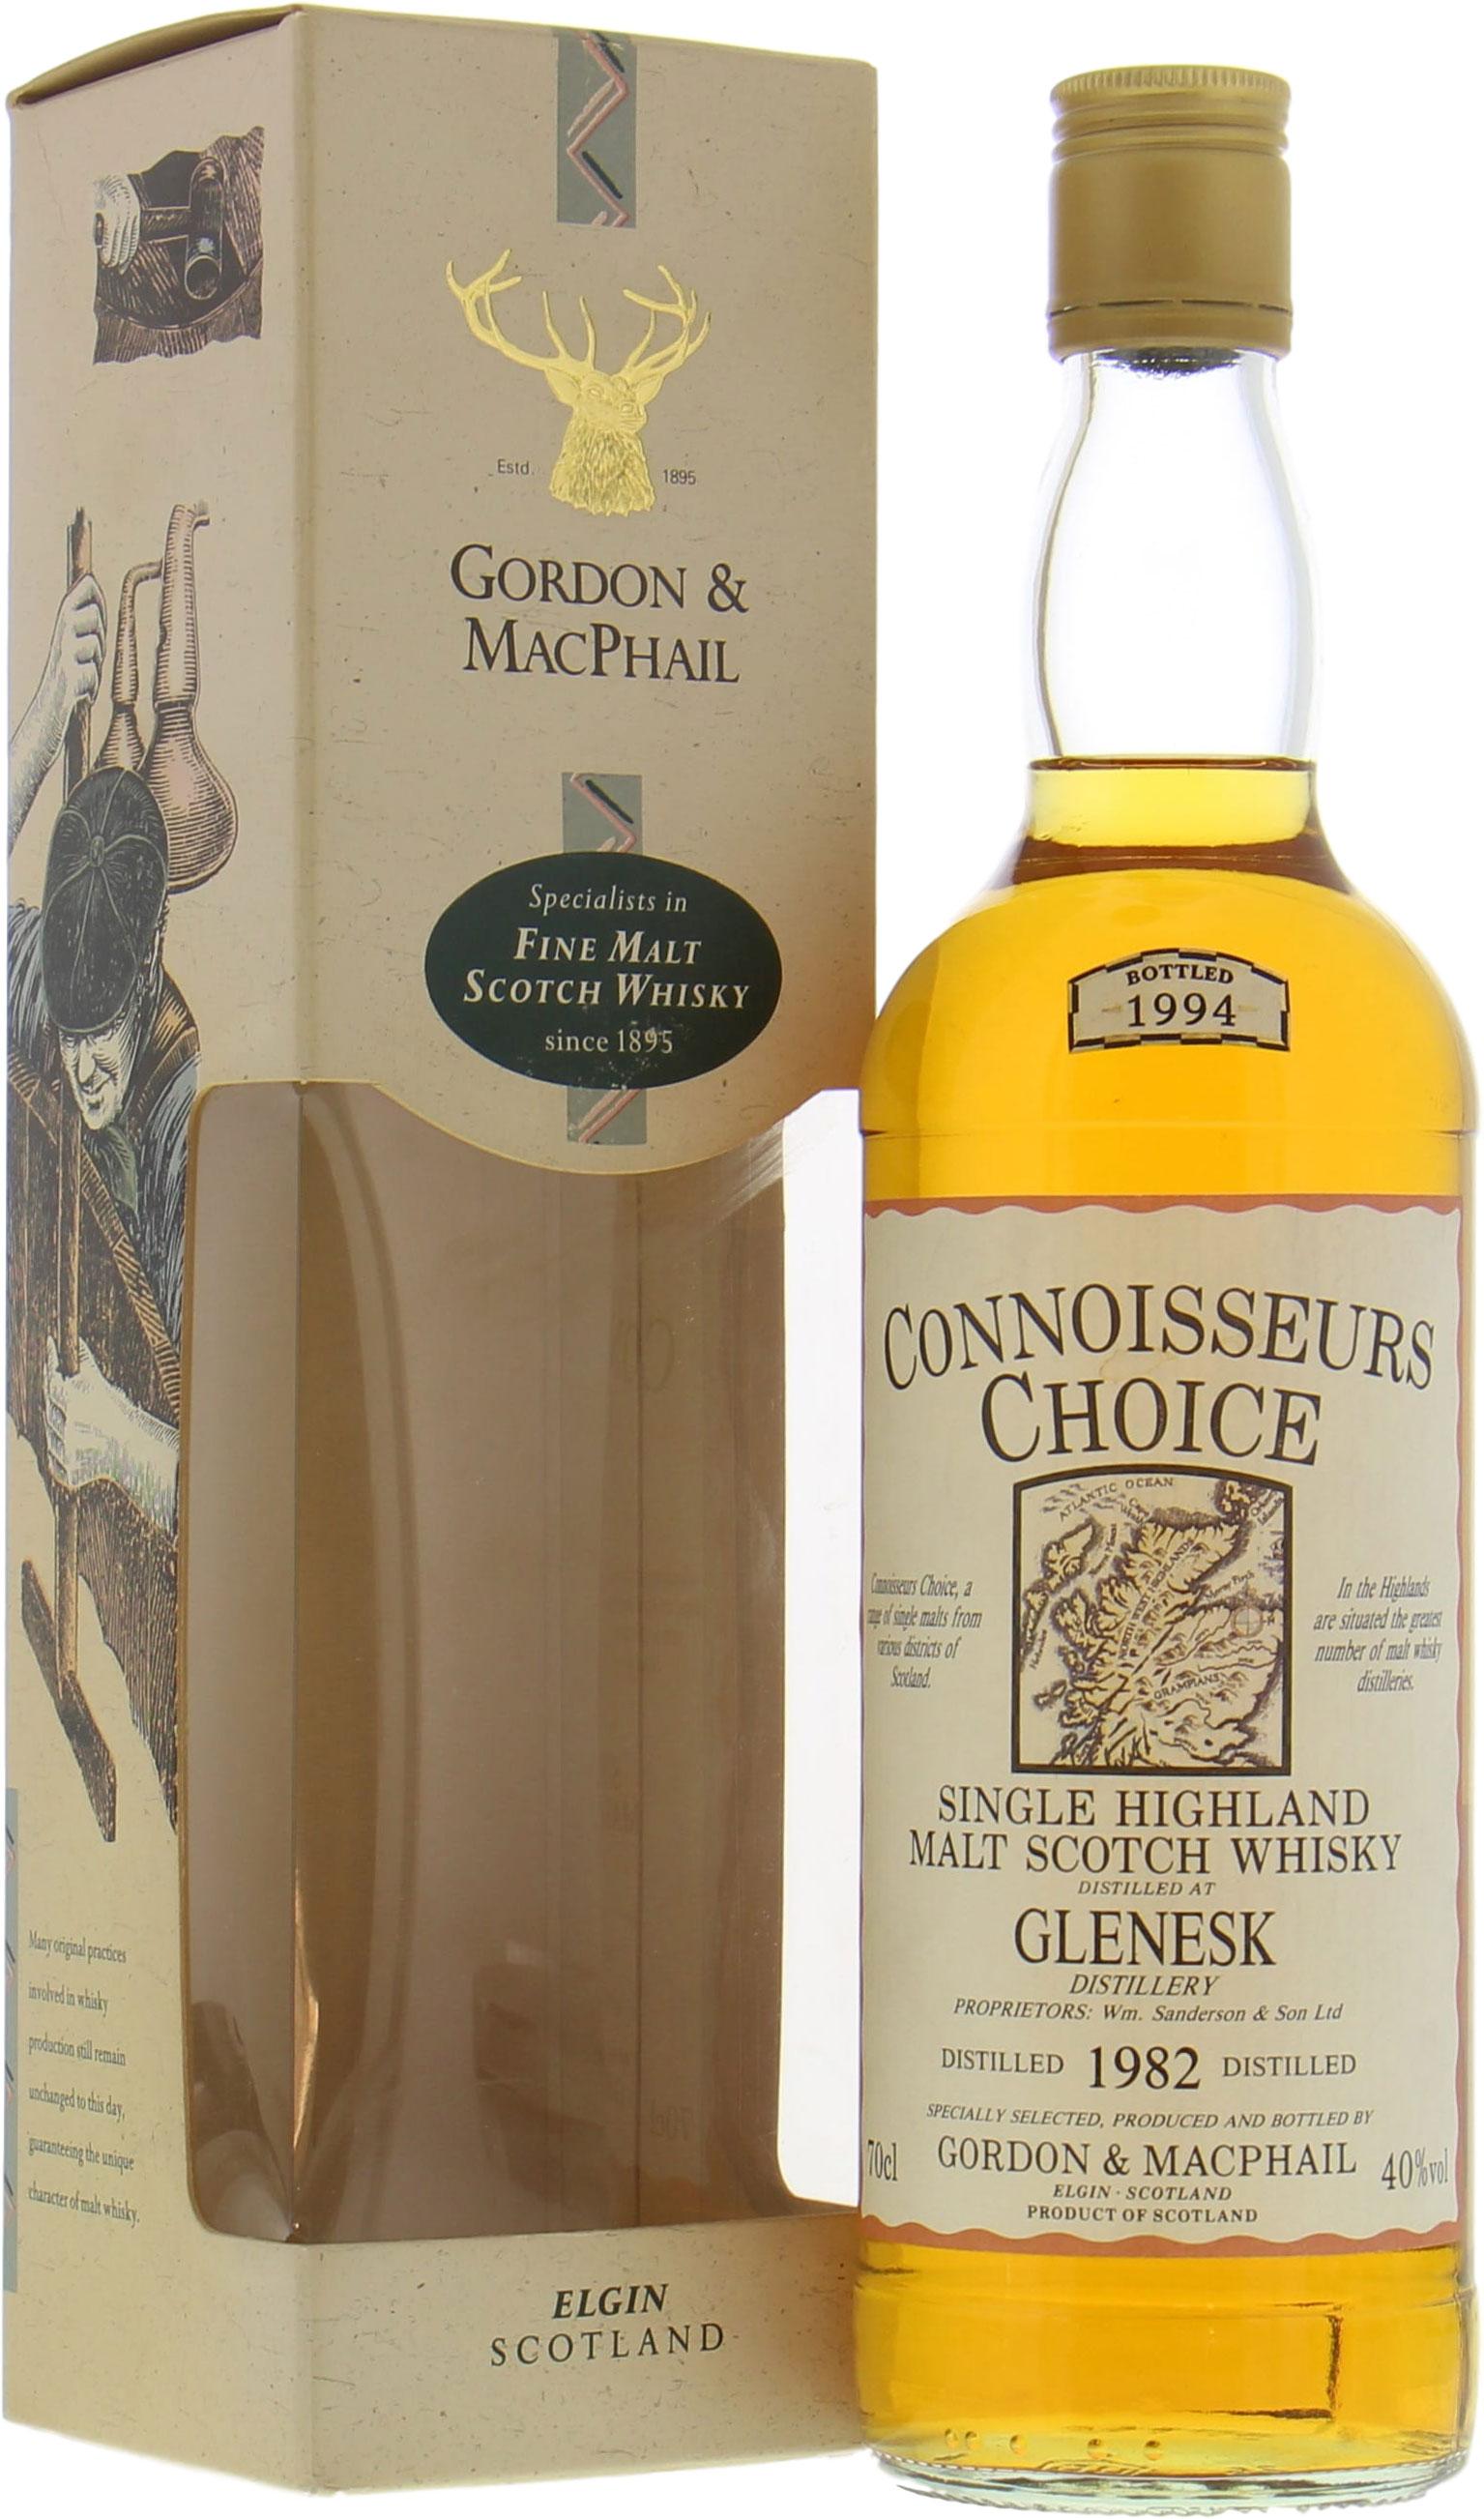 Glenesk 1982 Connoisseurs Choice Old Map Label 40% 1982